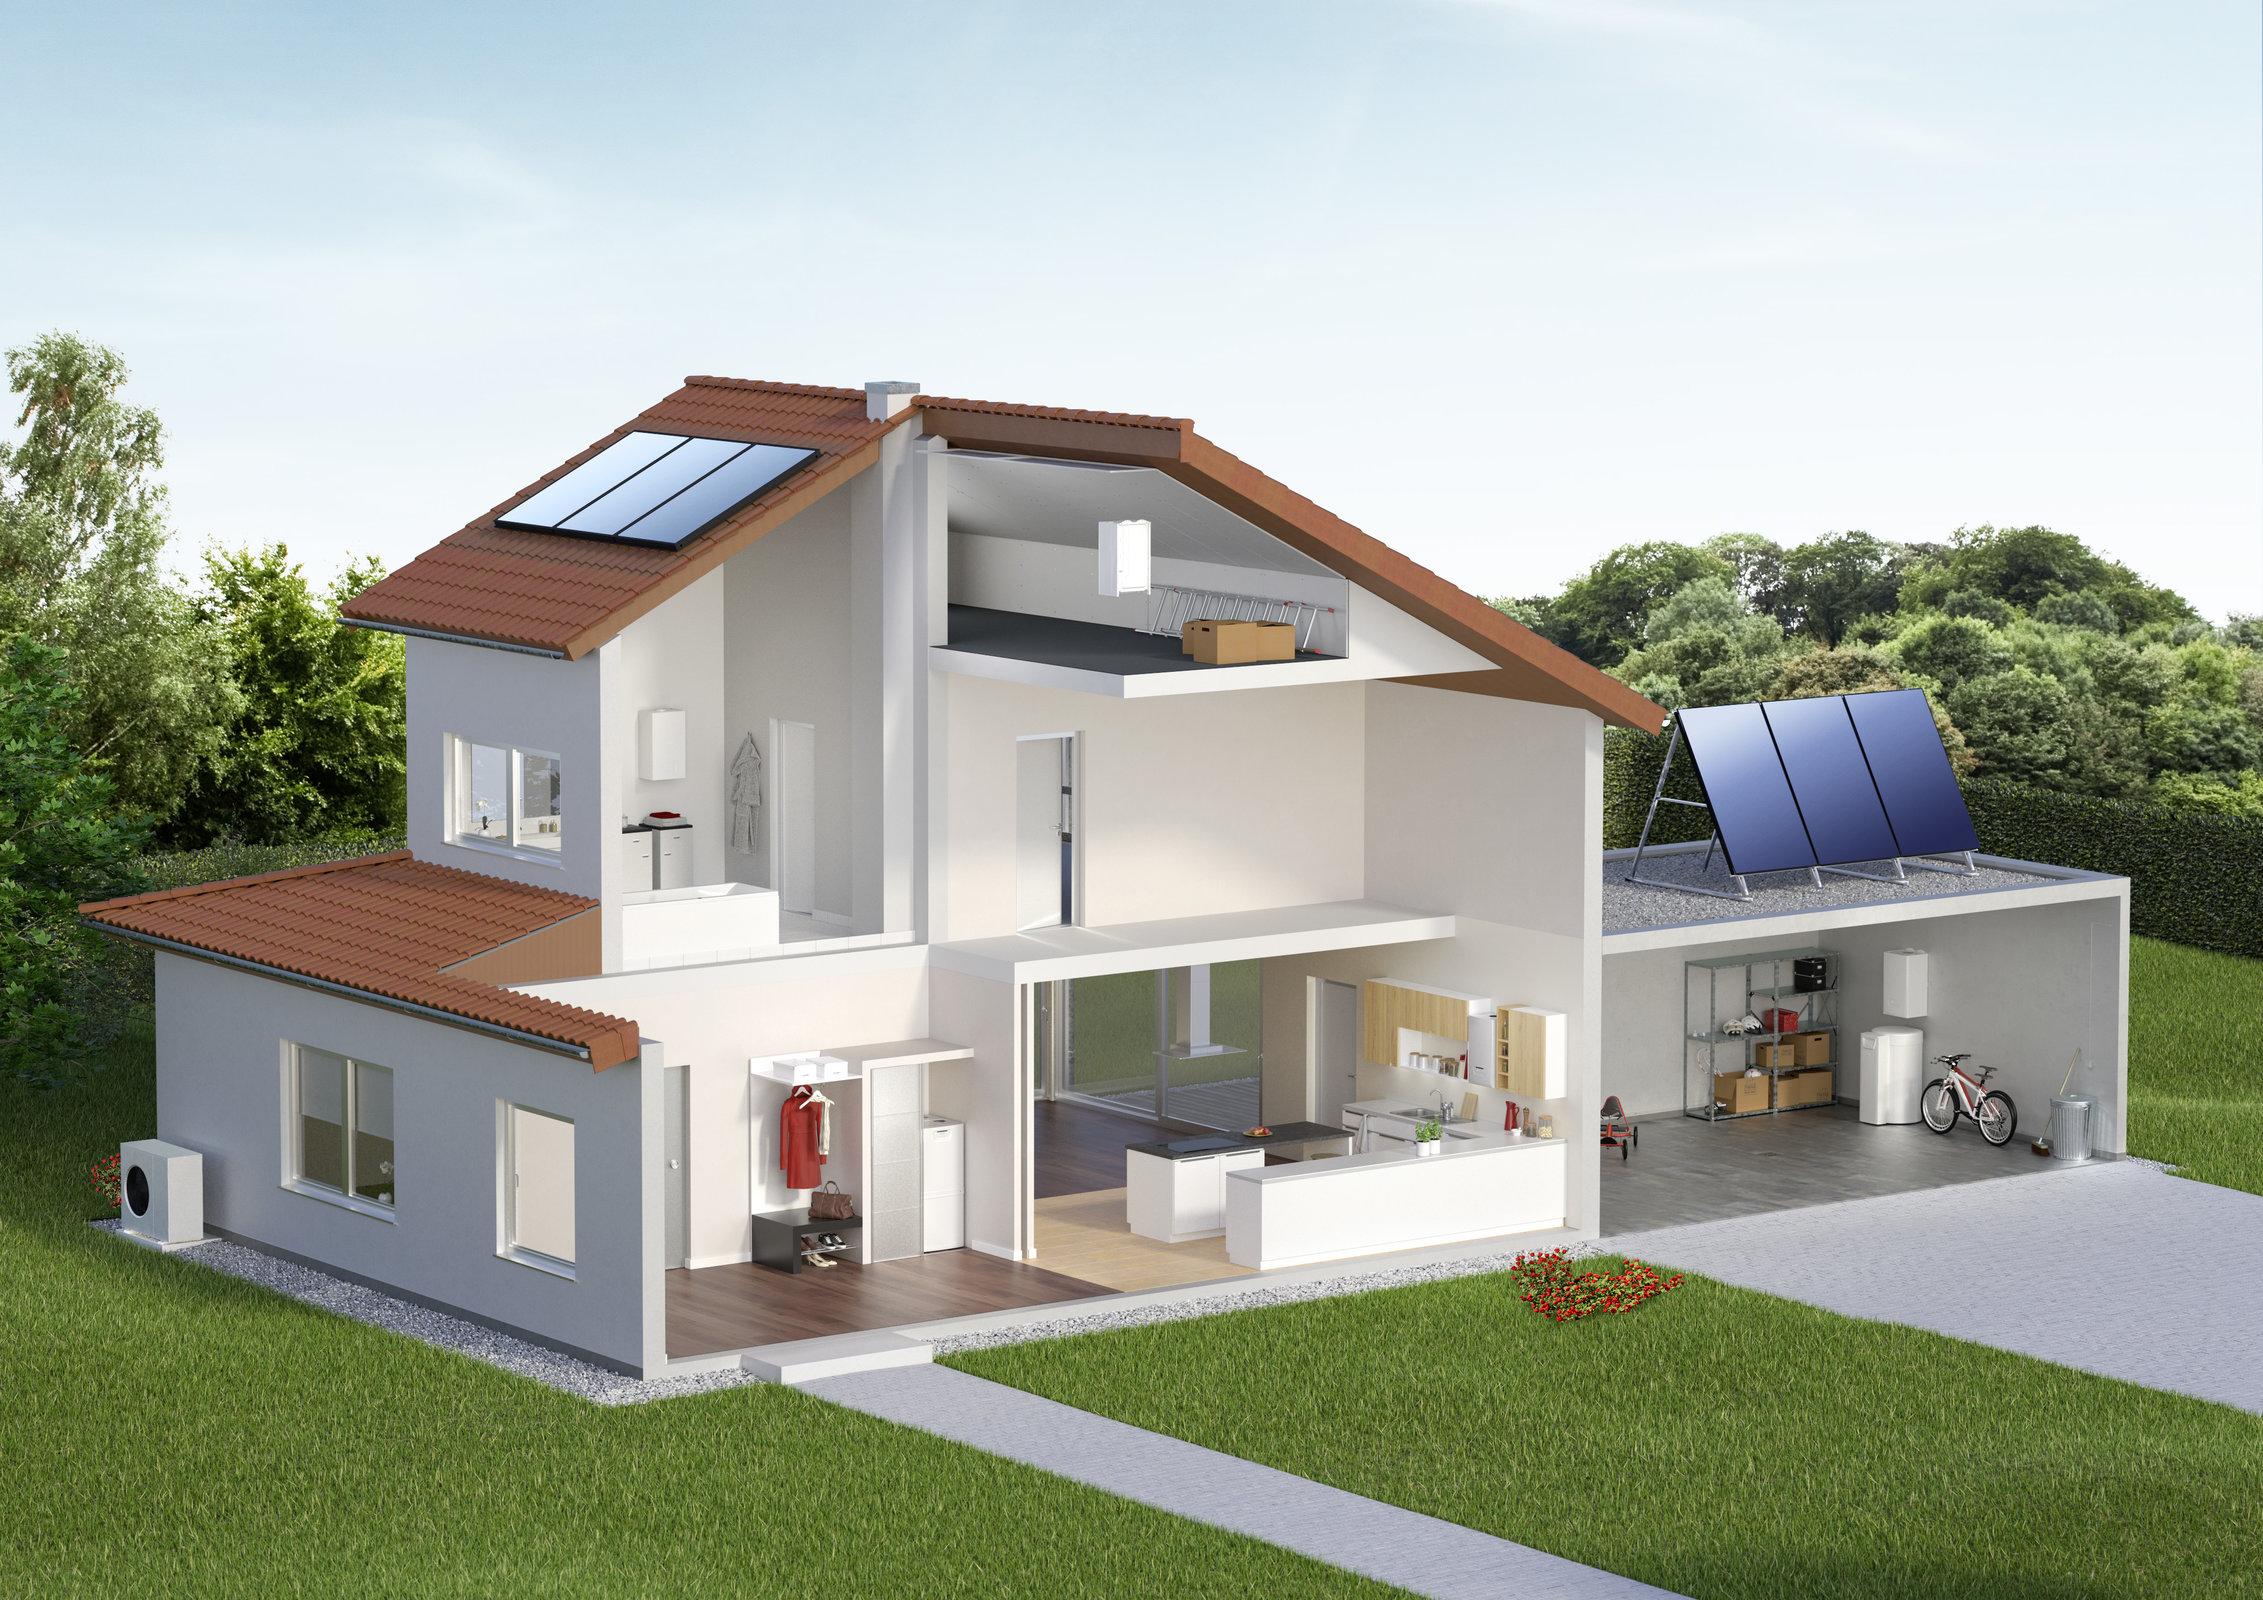 fotovoltaica y aerotermica